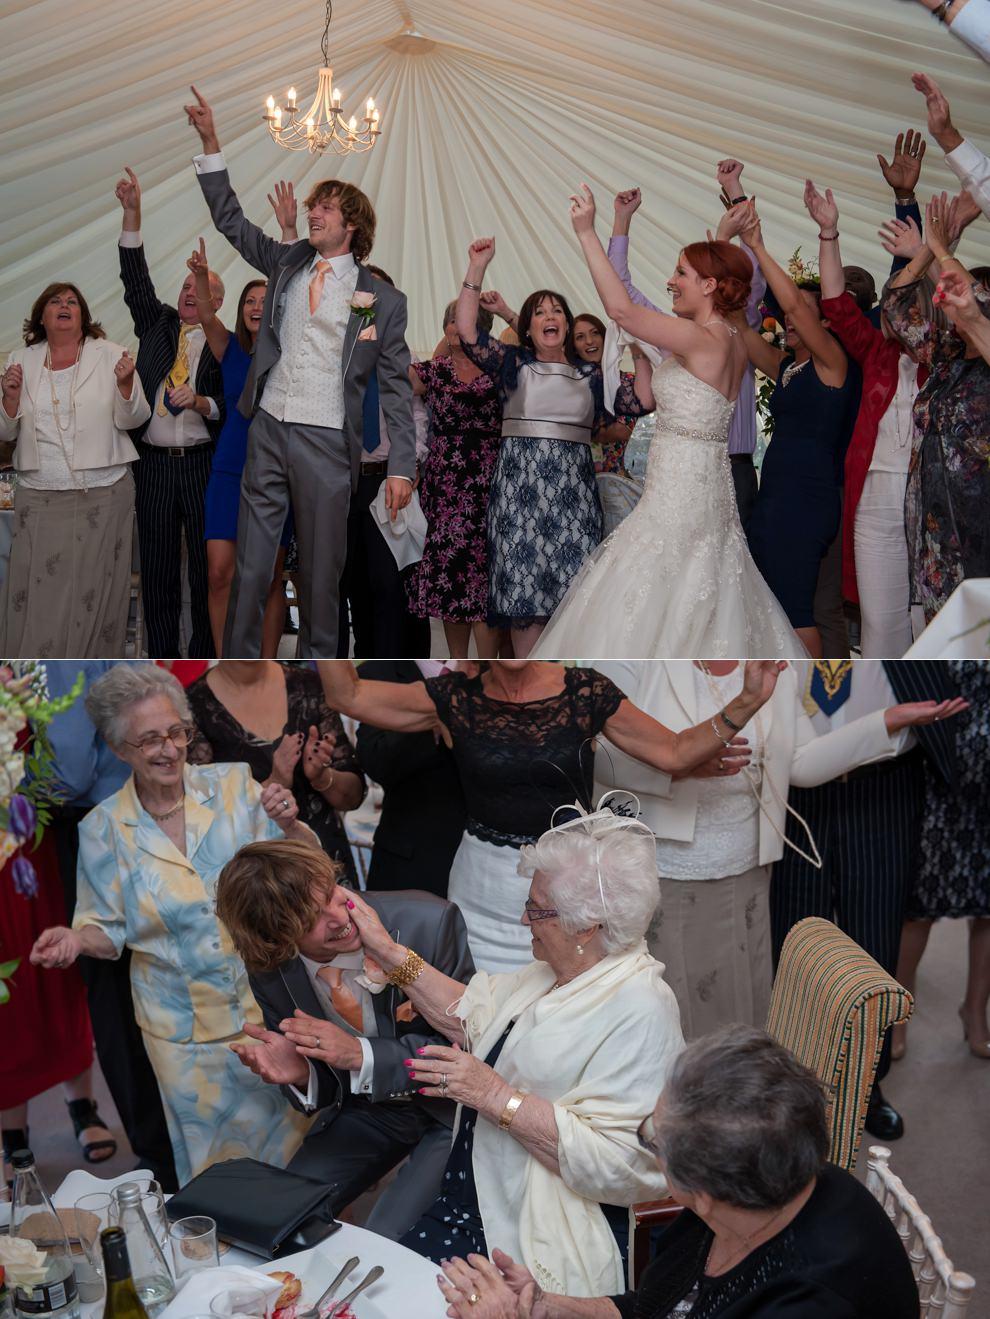 Debi Paul Wedding Photographer Hertfordshire (35)